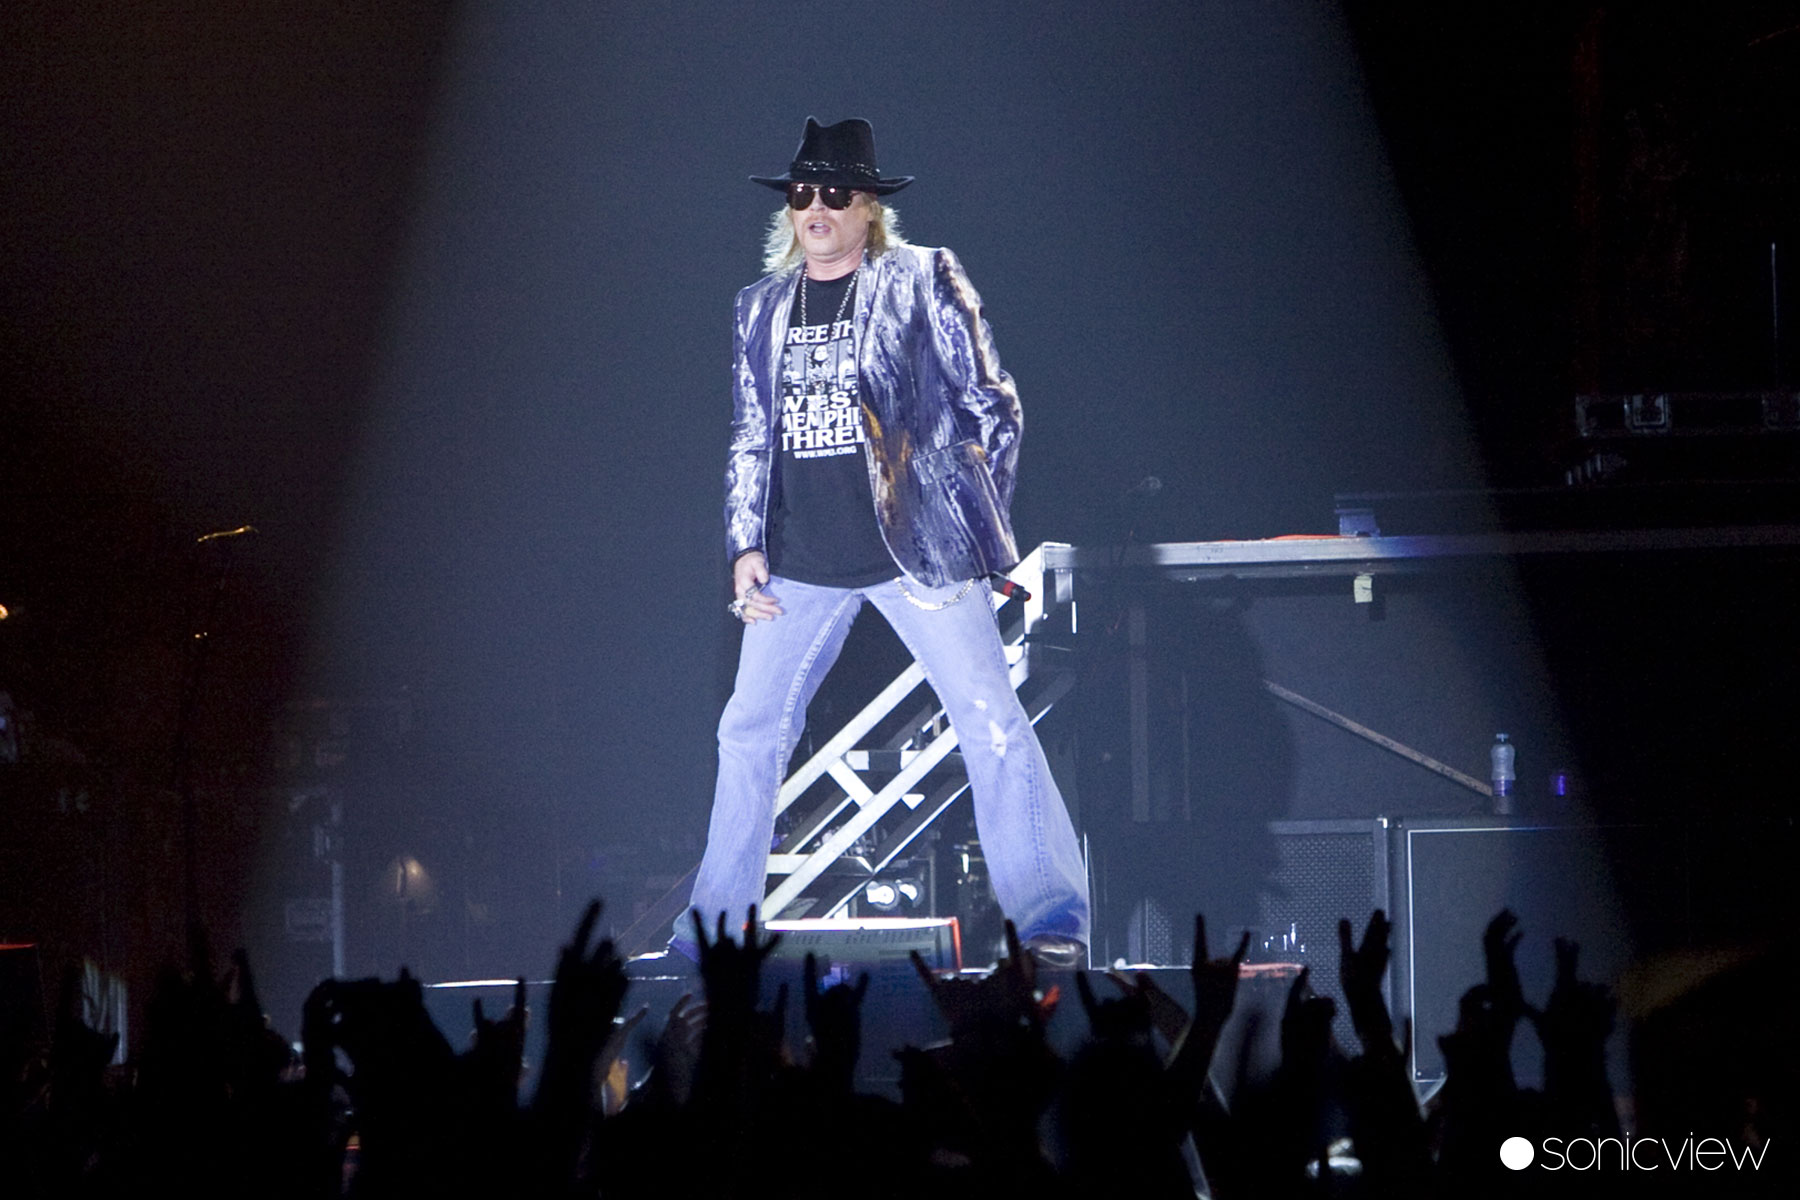 Guns N' Roses: Live at Gigantium 2011, Aalborg, Denmark